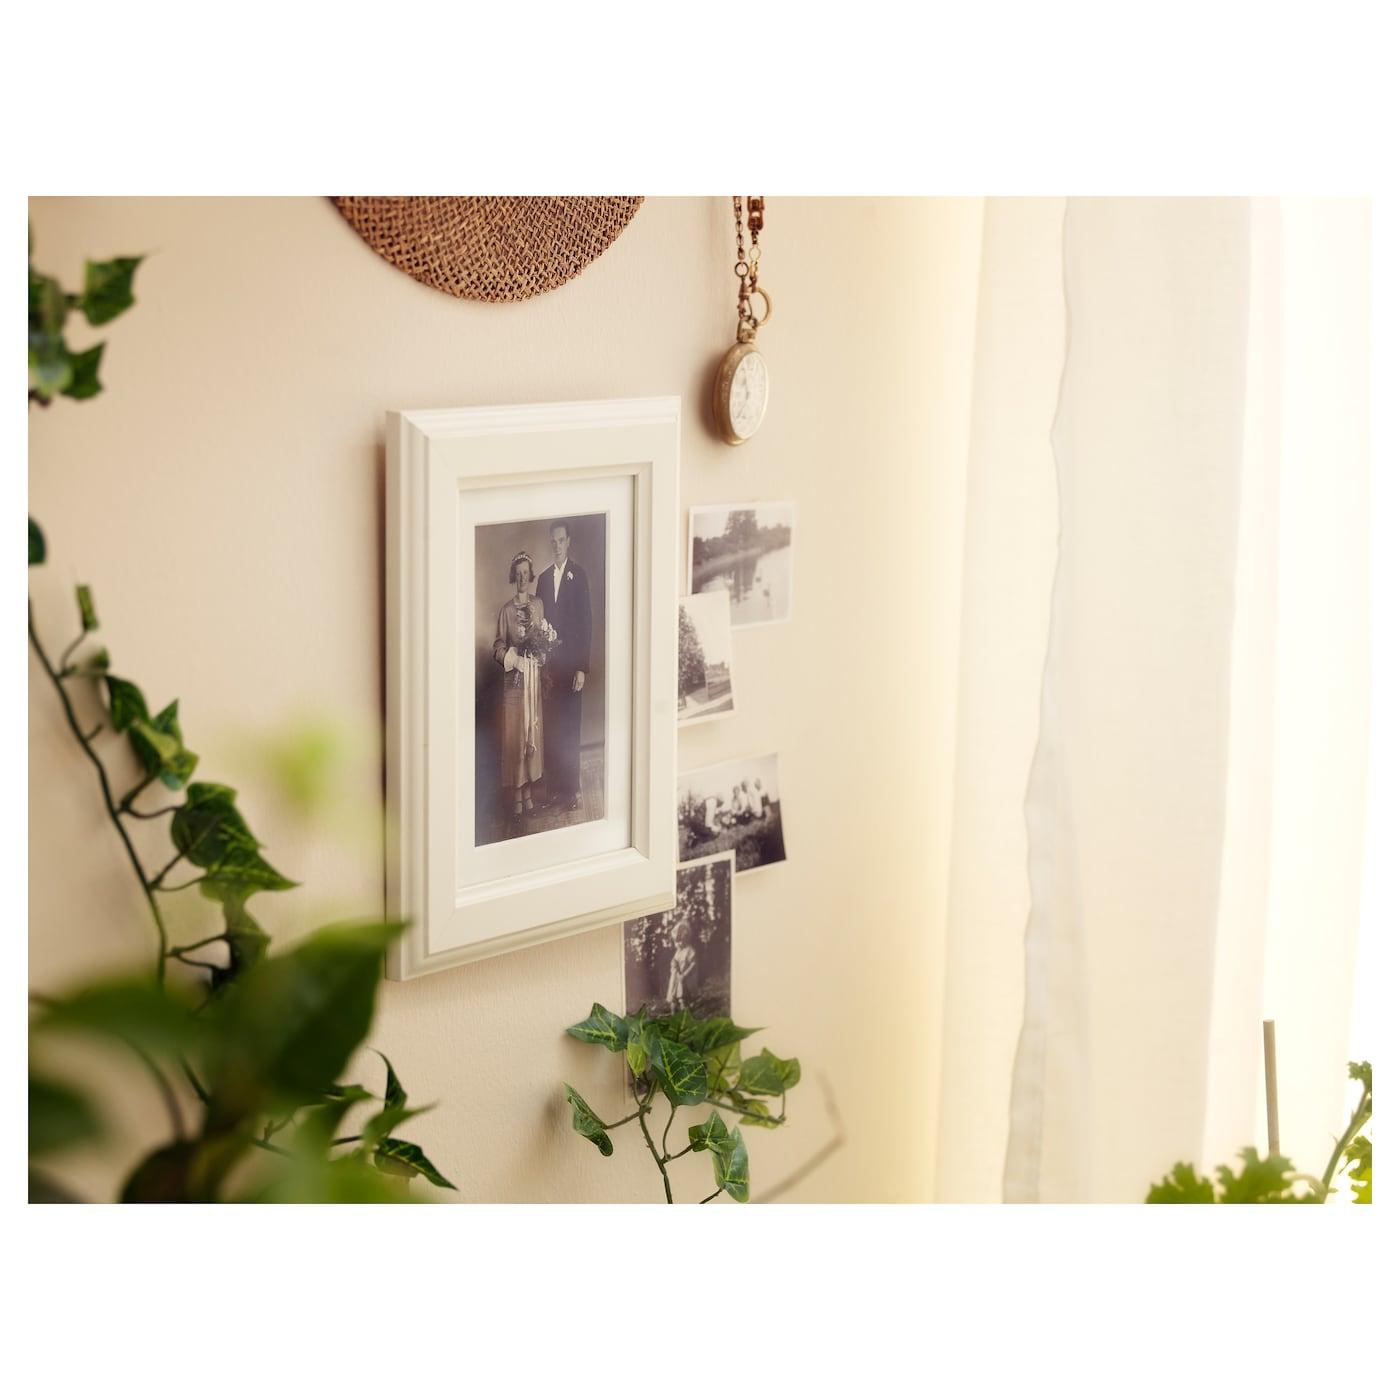 VIRSERUM Frame White 13 x 18 cm - IKEA